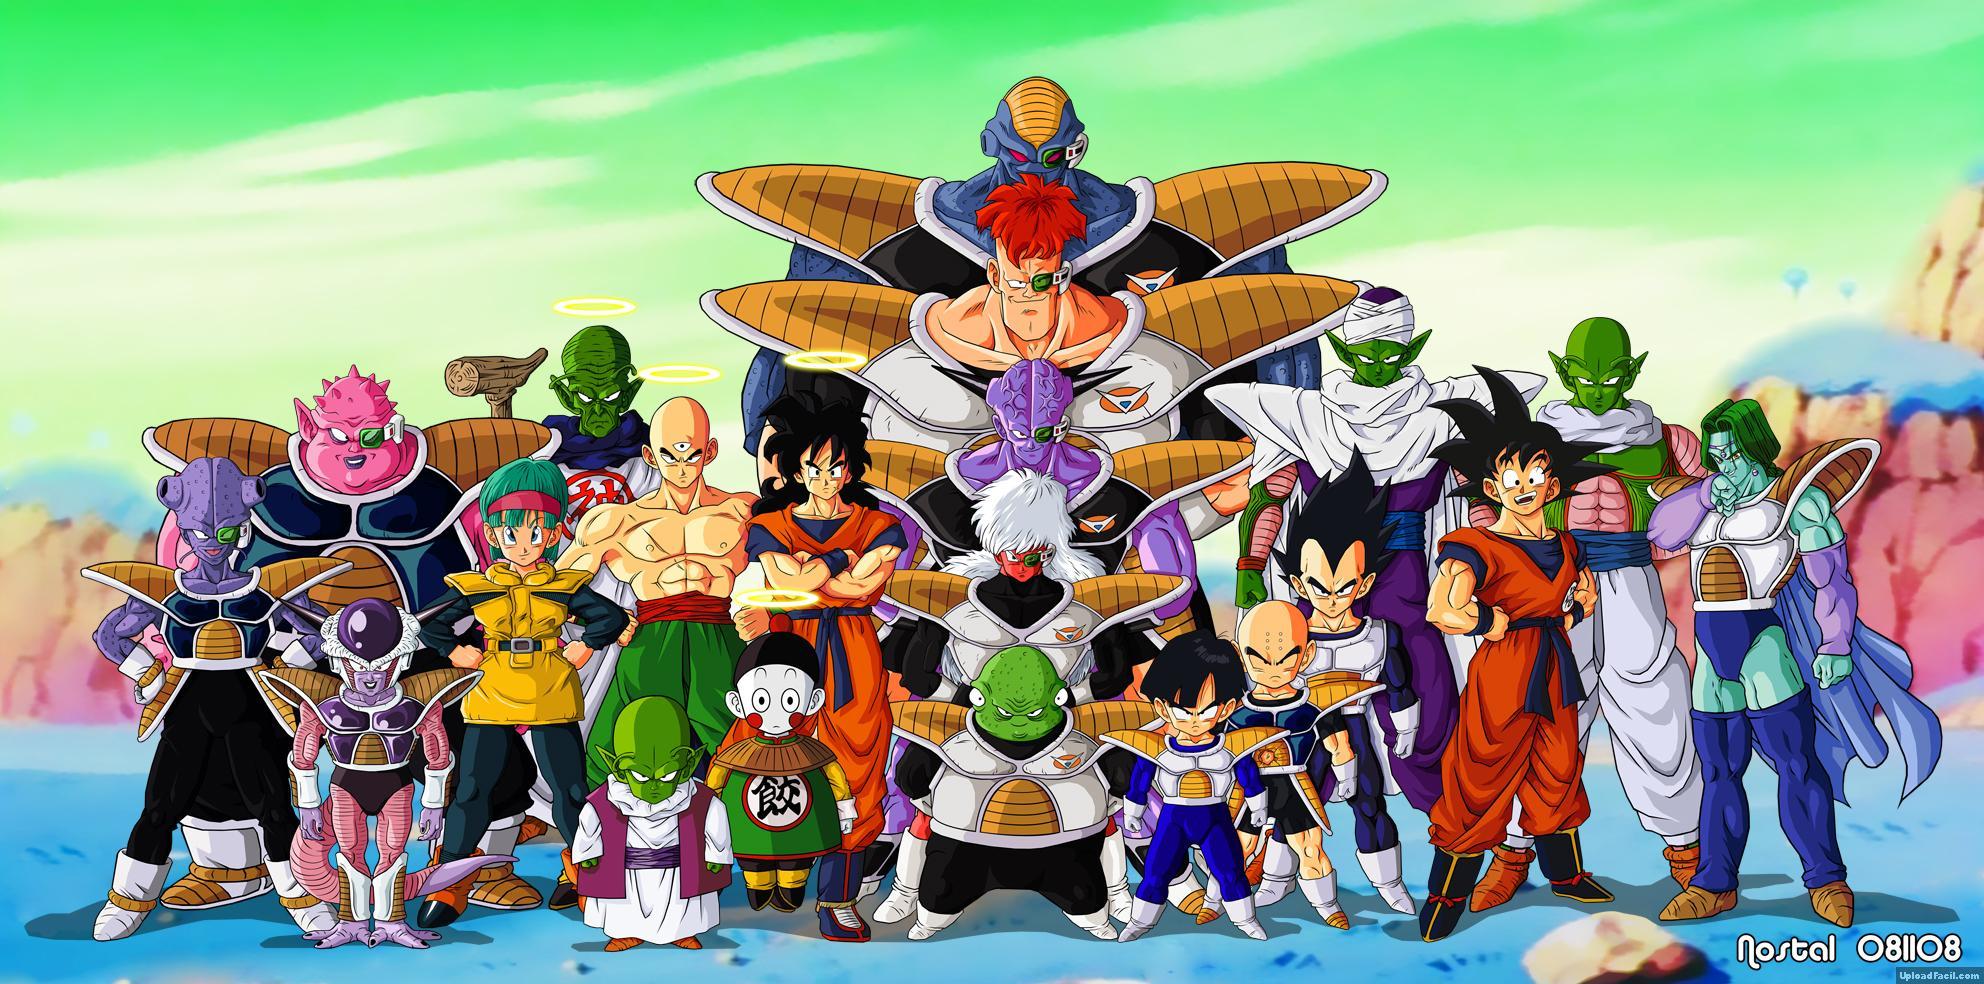 Dragon Ball Z Wallpapers, Anime, Hq Dragon Ball Z Pictures à Dessin Animé De Dragon Ball Z